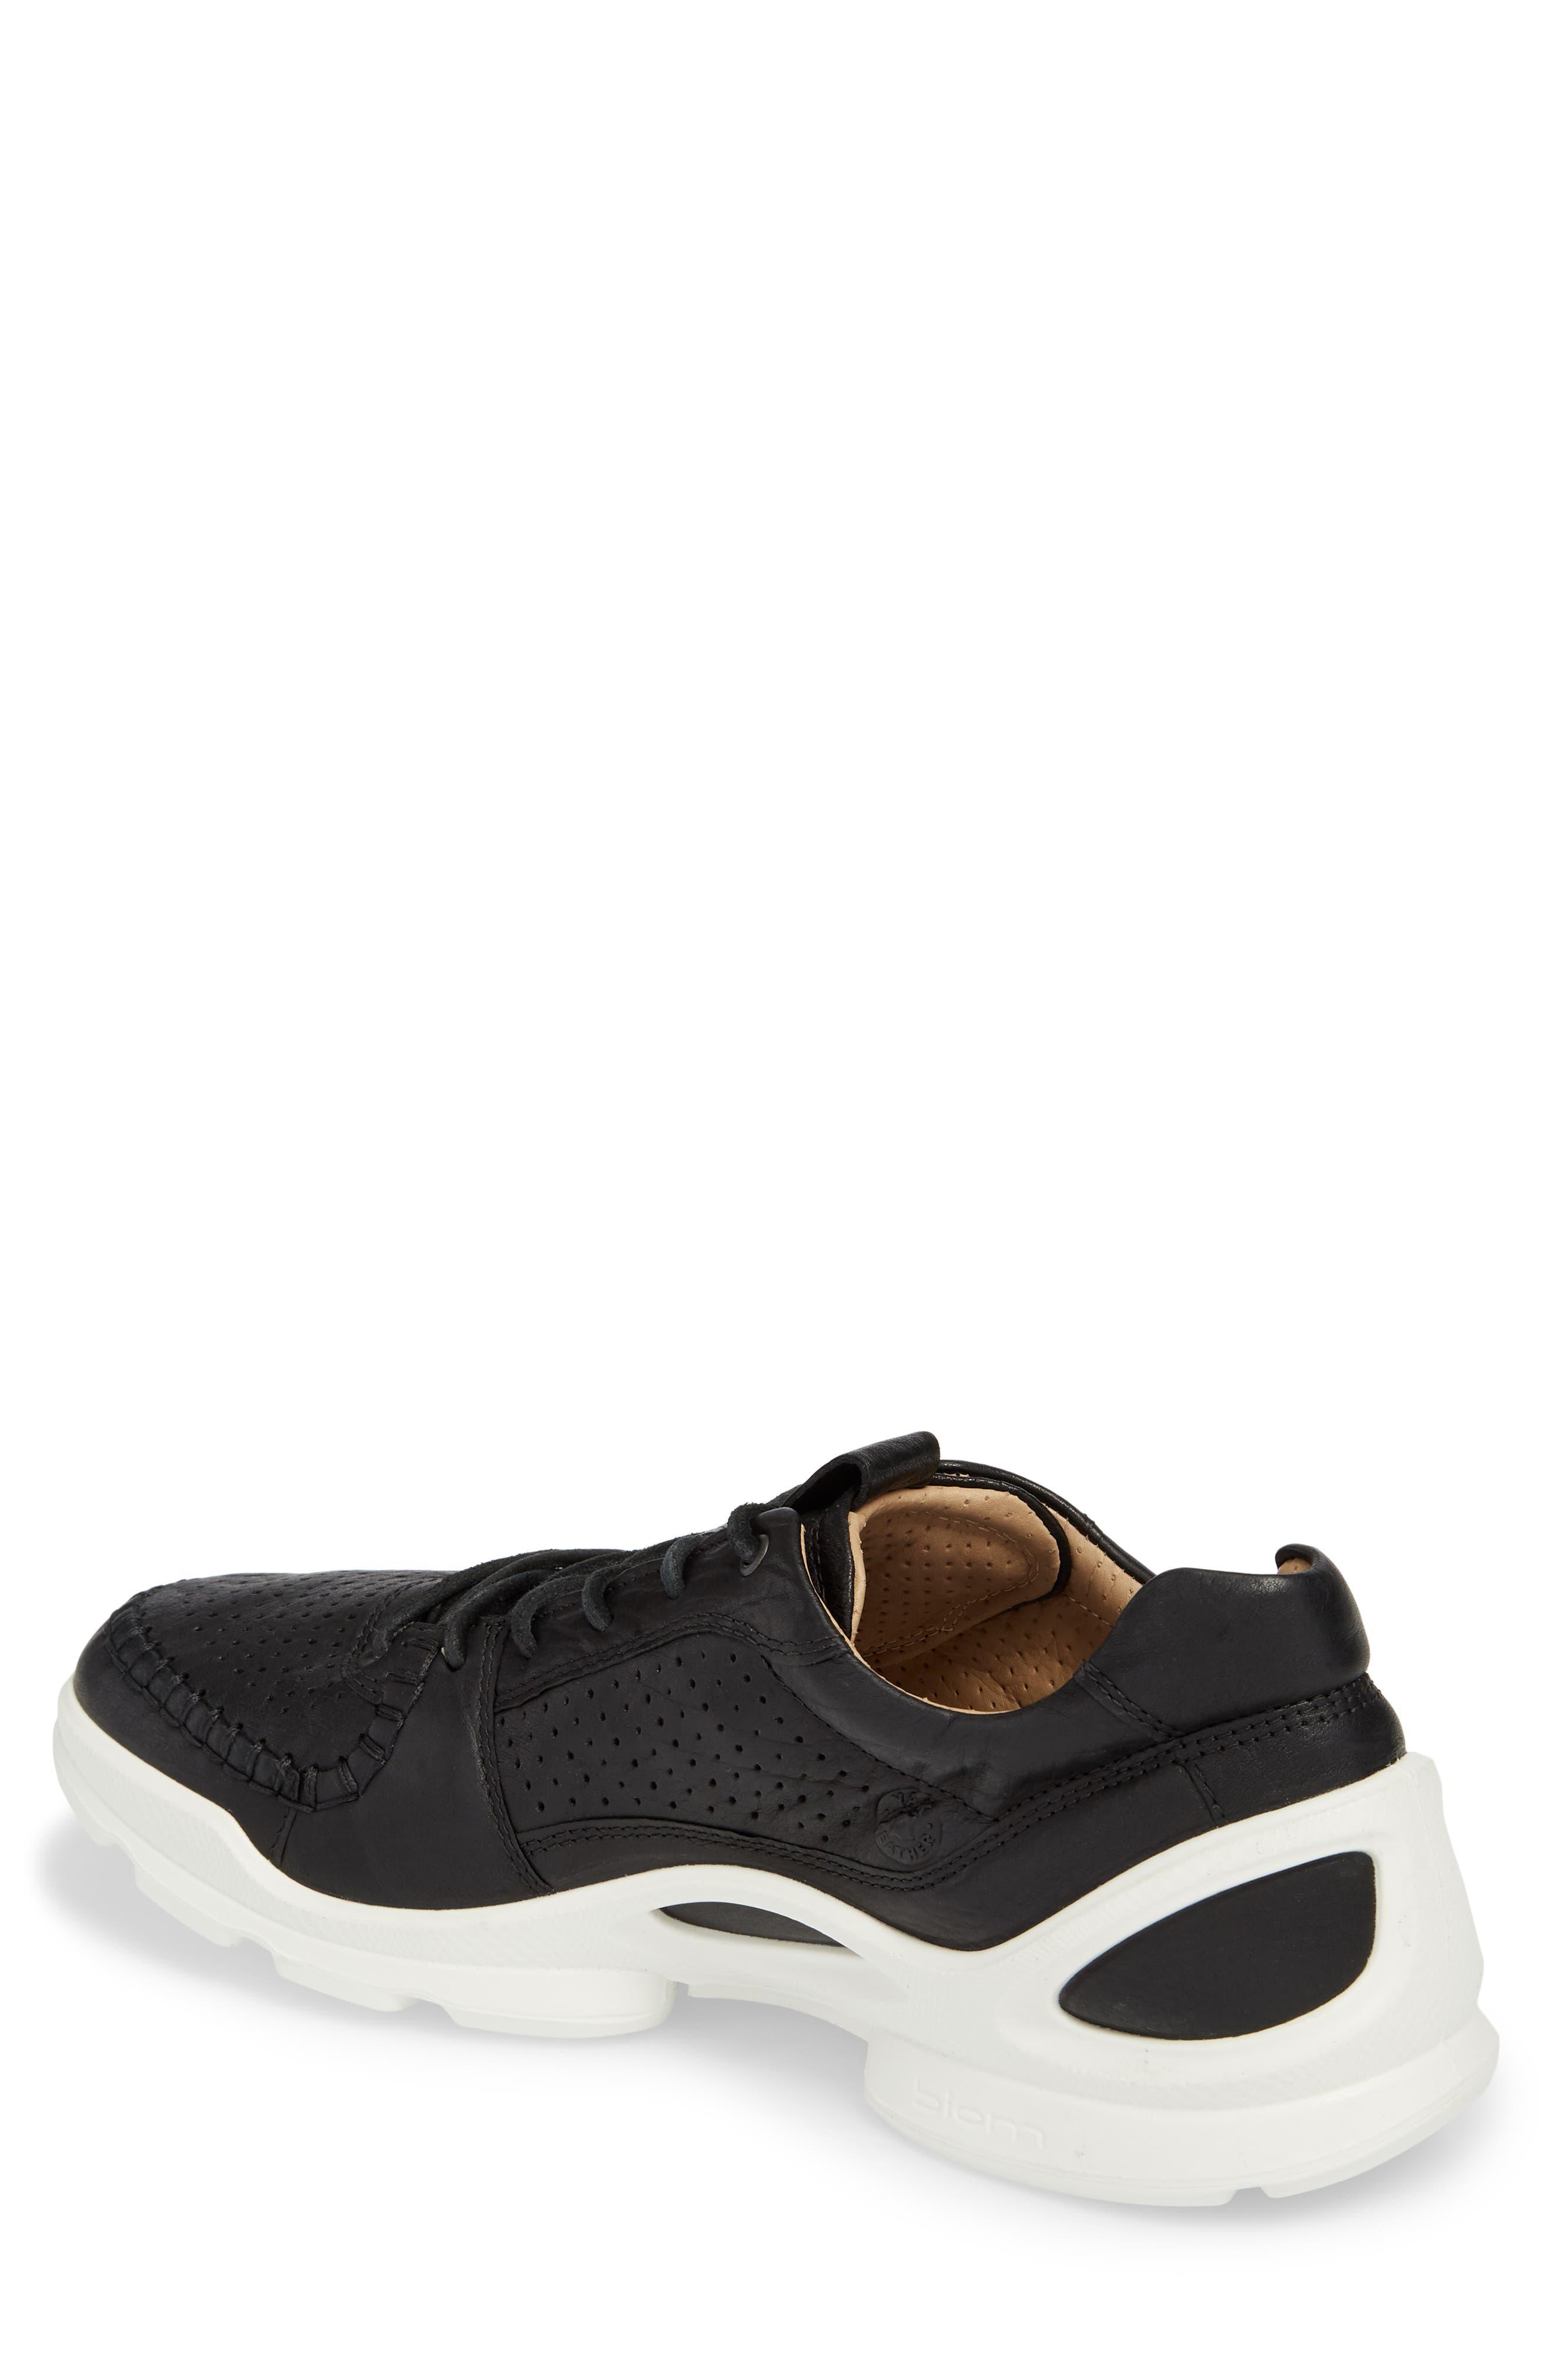 BIOM Street Moc Toe Sneaker,                             Alternate thumbnail 2, color,                             Black Leather